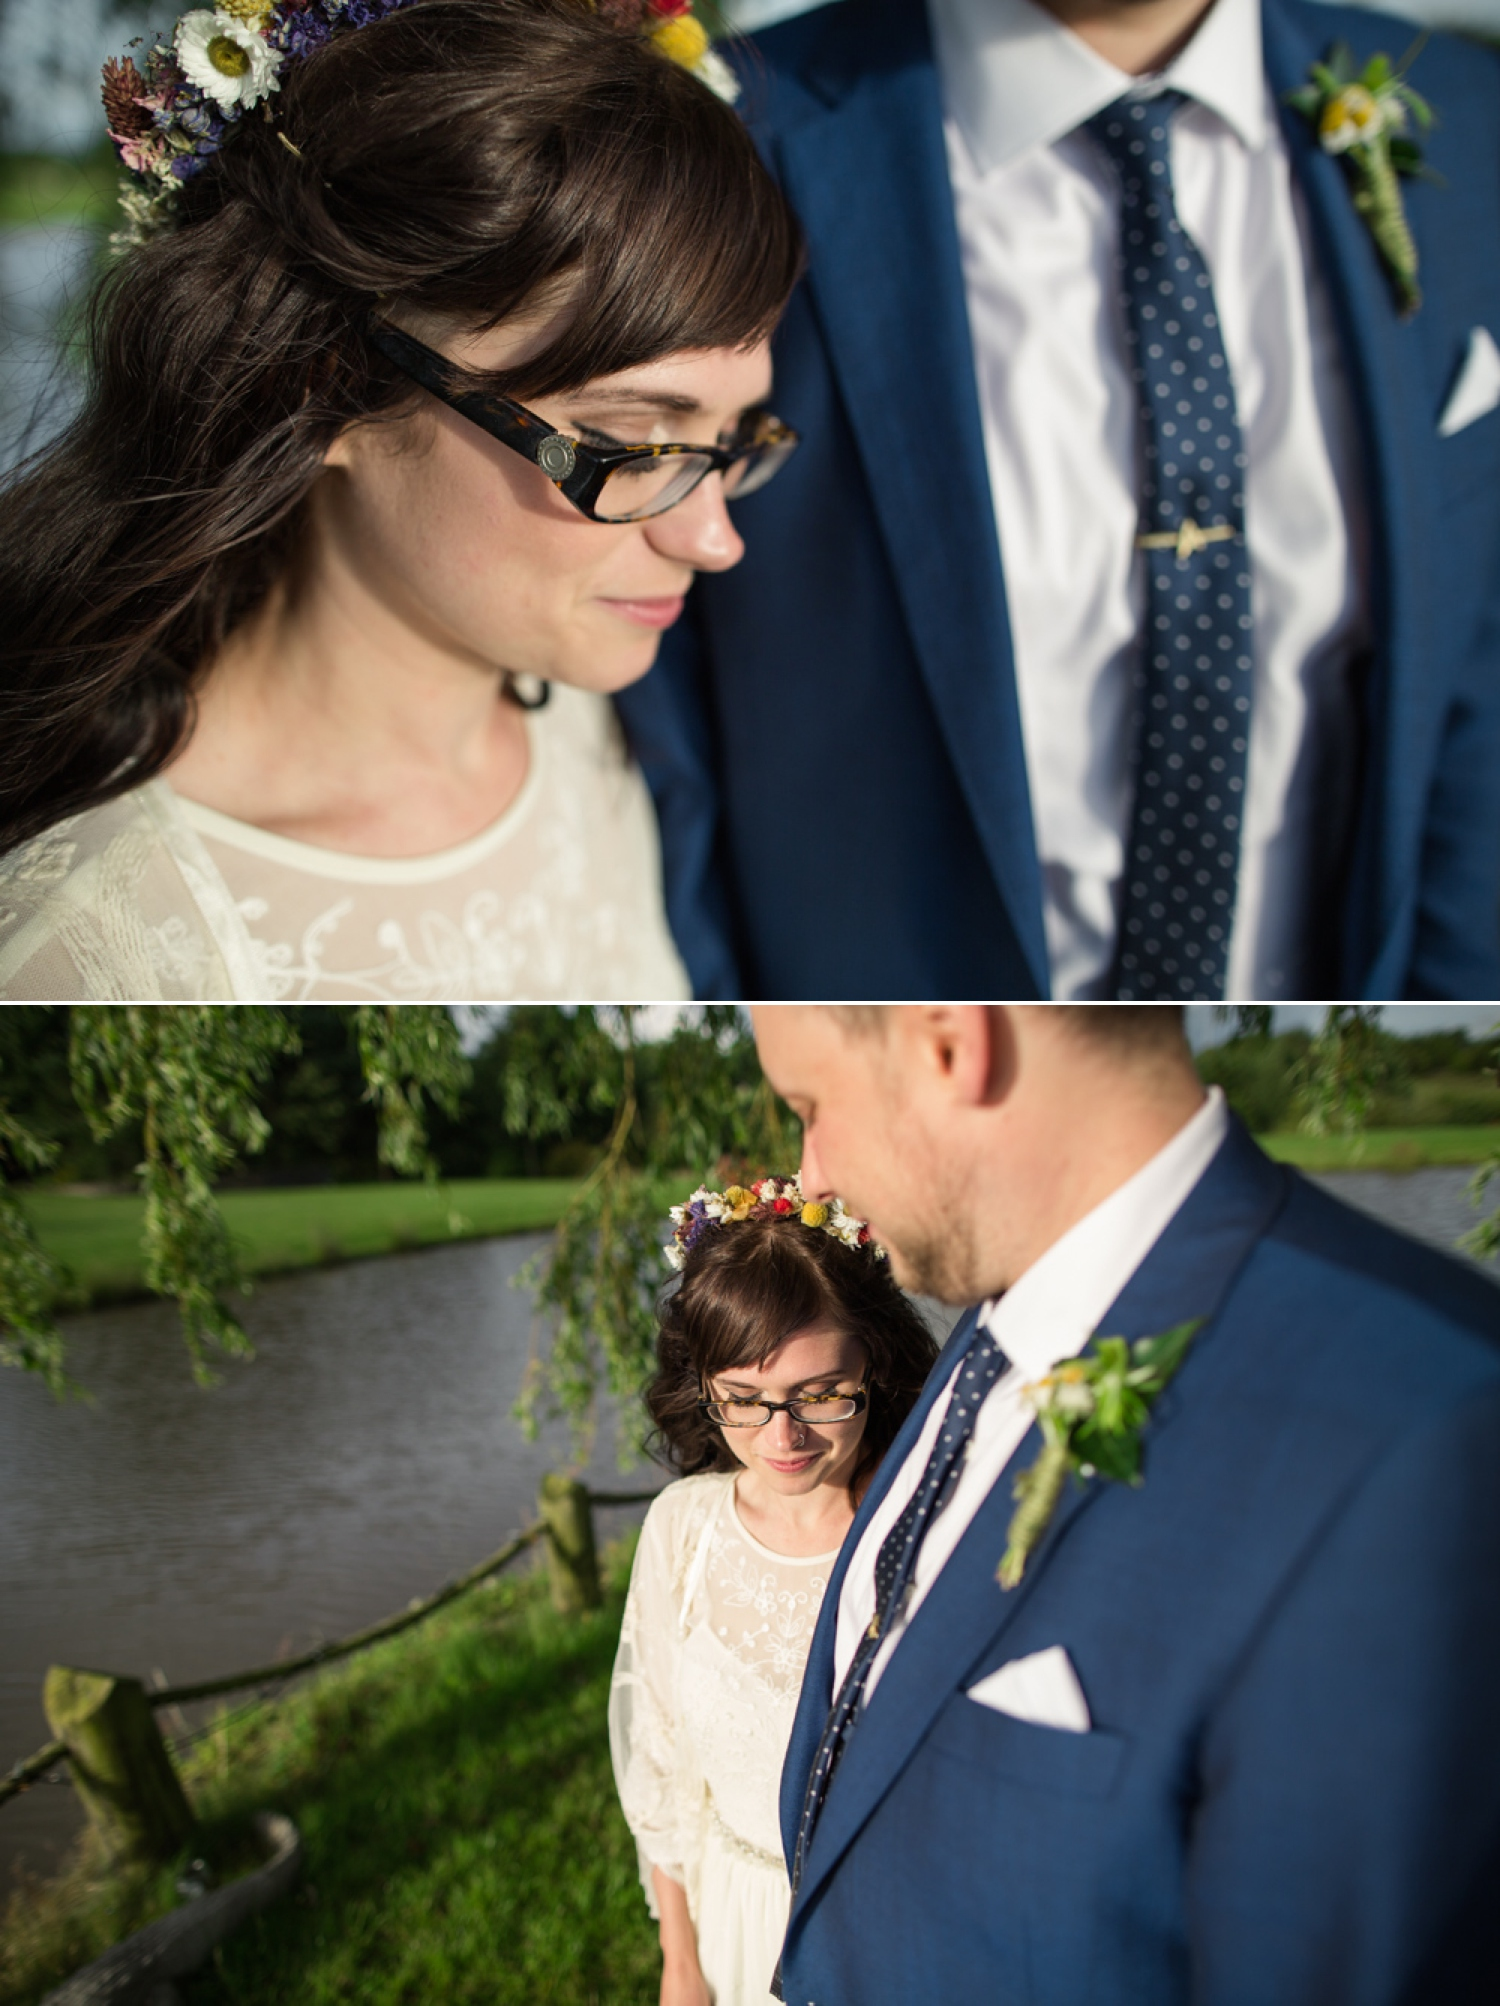 Somerset Wedding Photographer Elly & Liam_0032.jpg